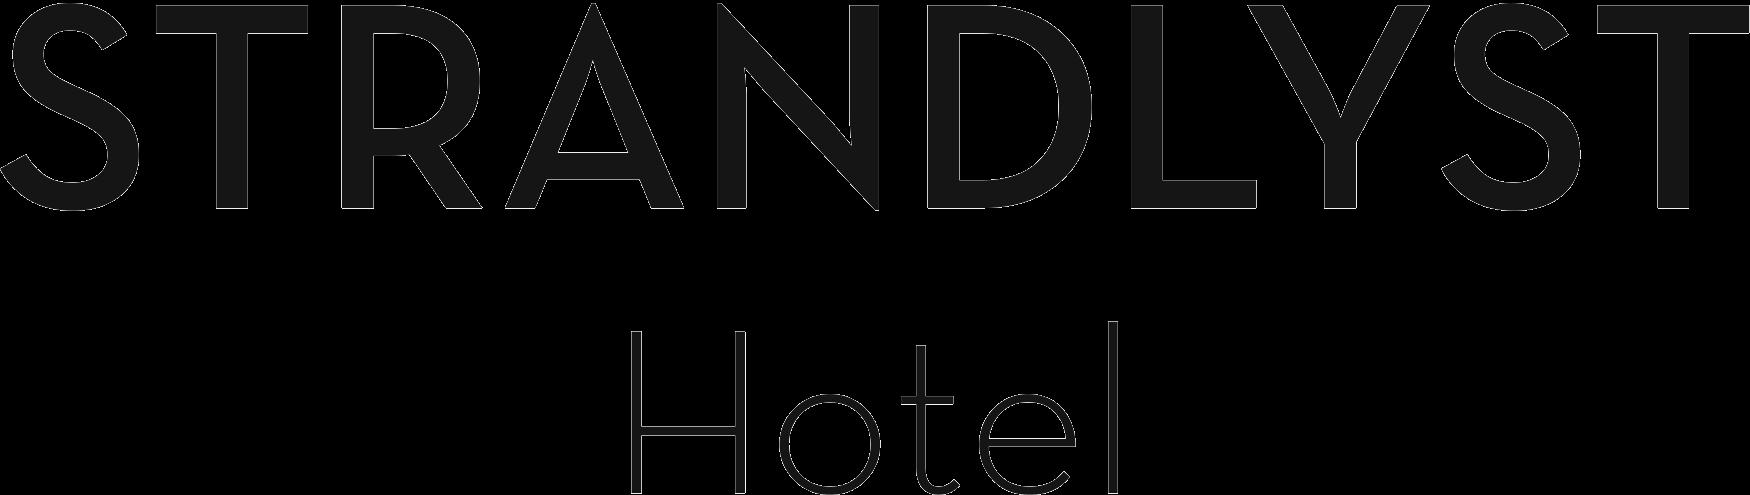 Strandlyst-hotel-logo-LifePeaks.png